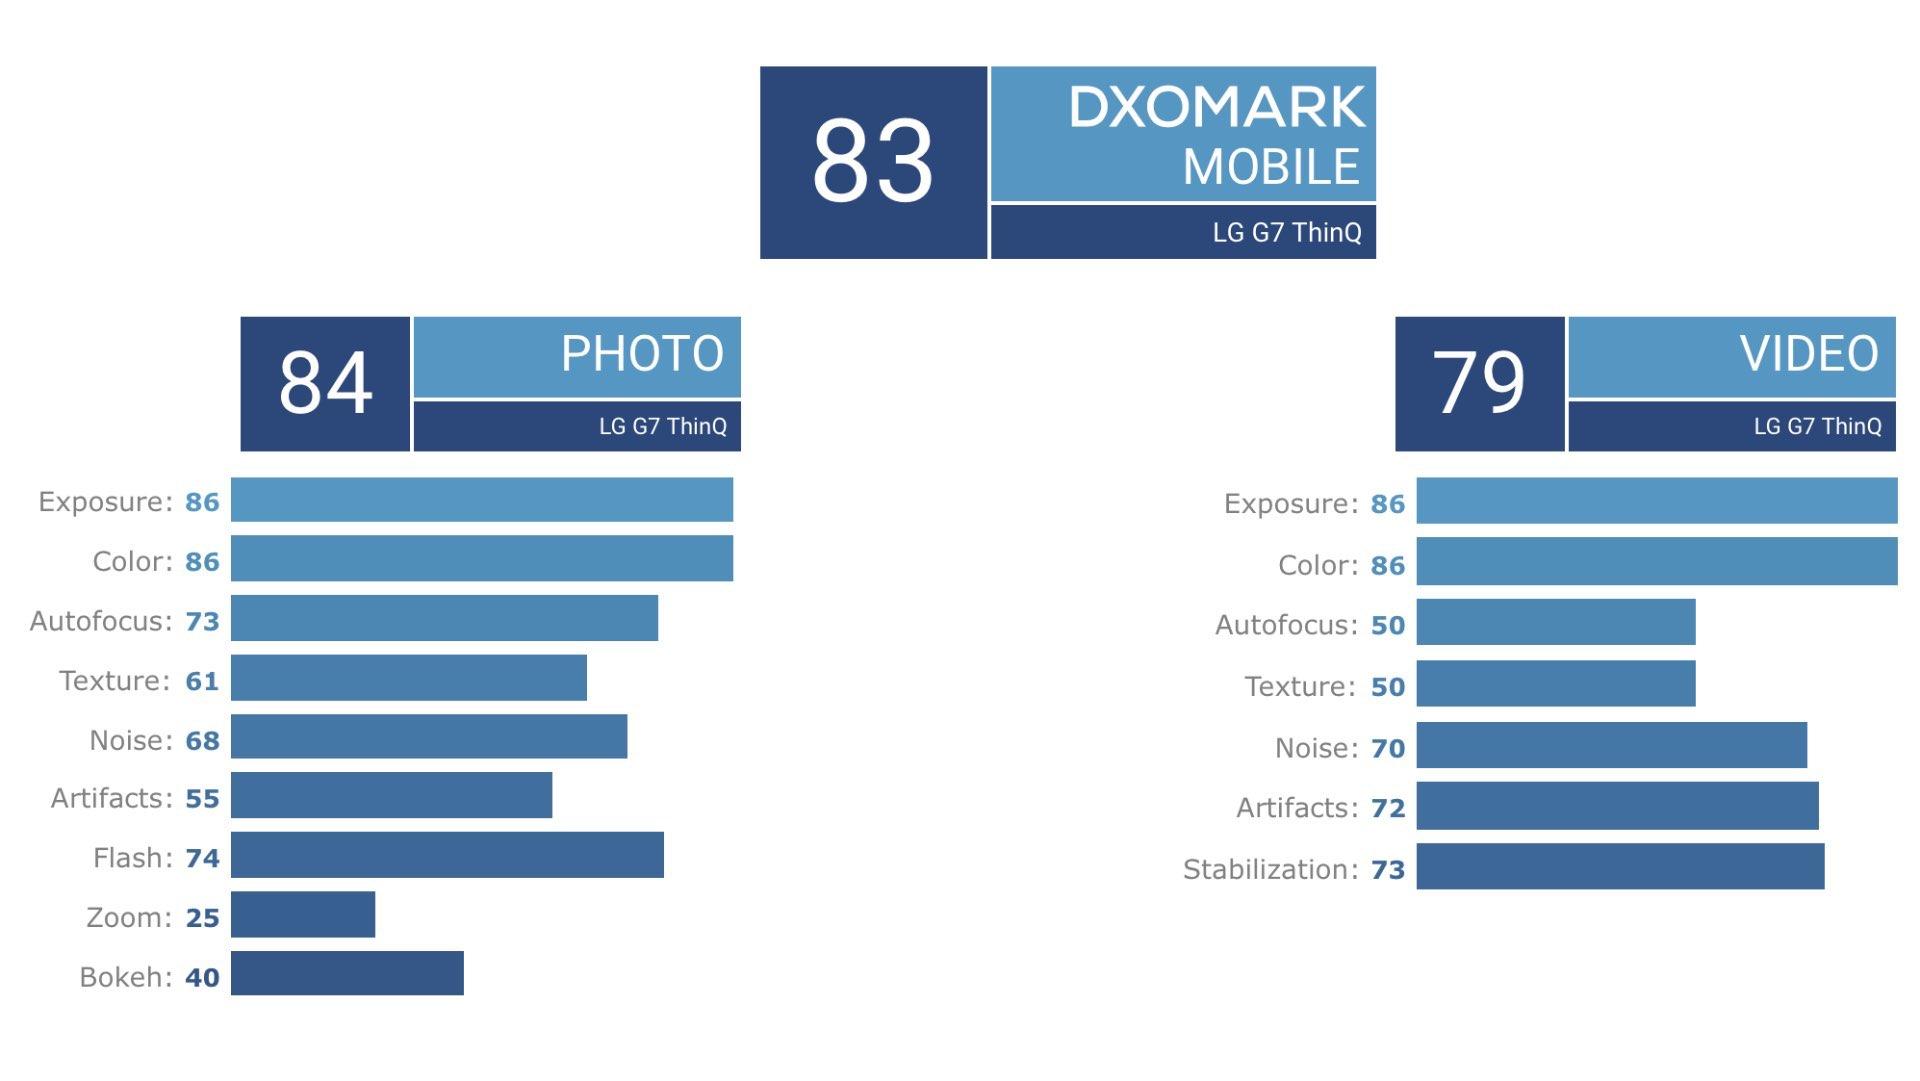 LG G7 ThinQ – DxOMark